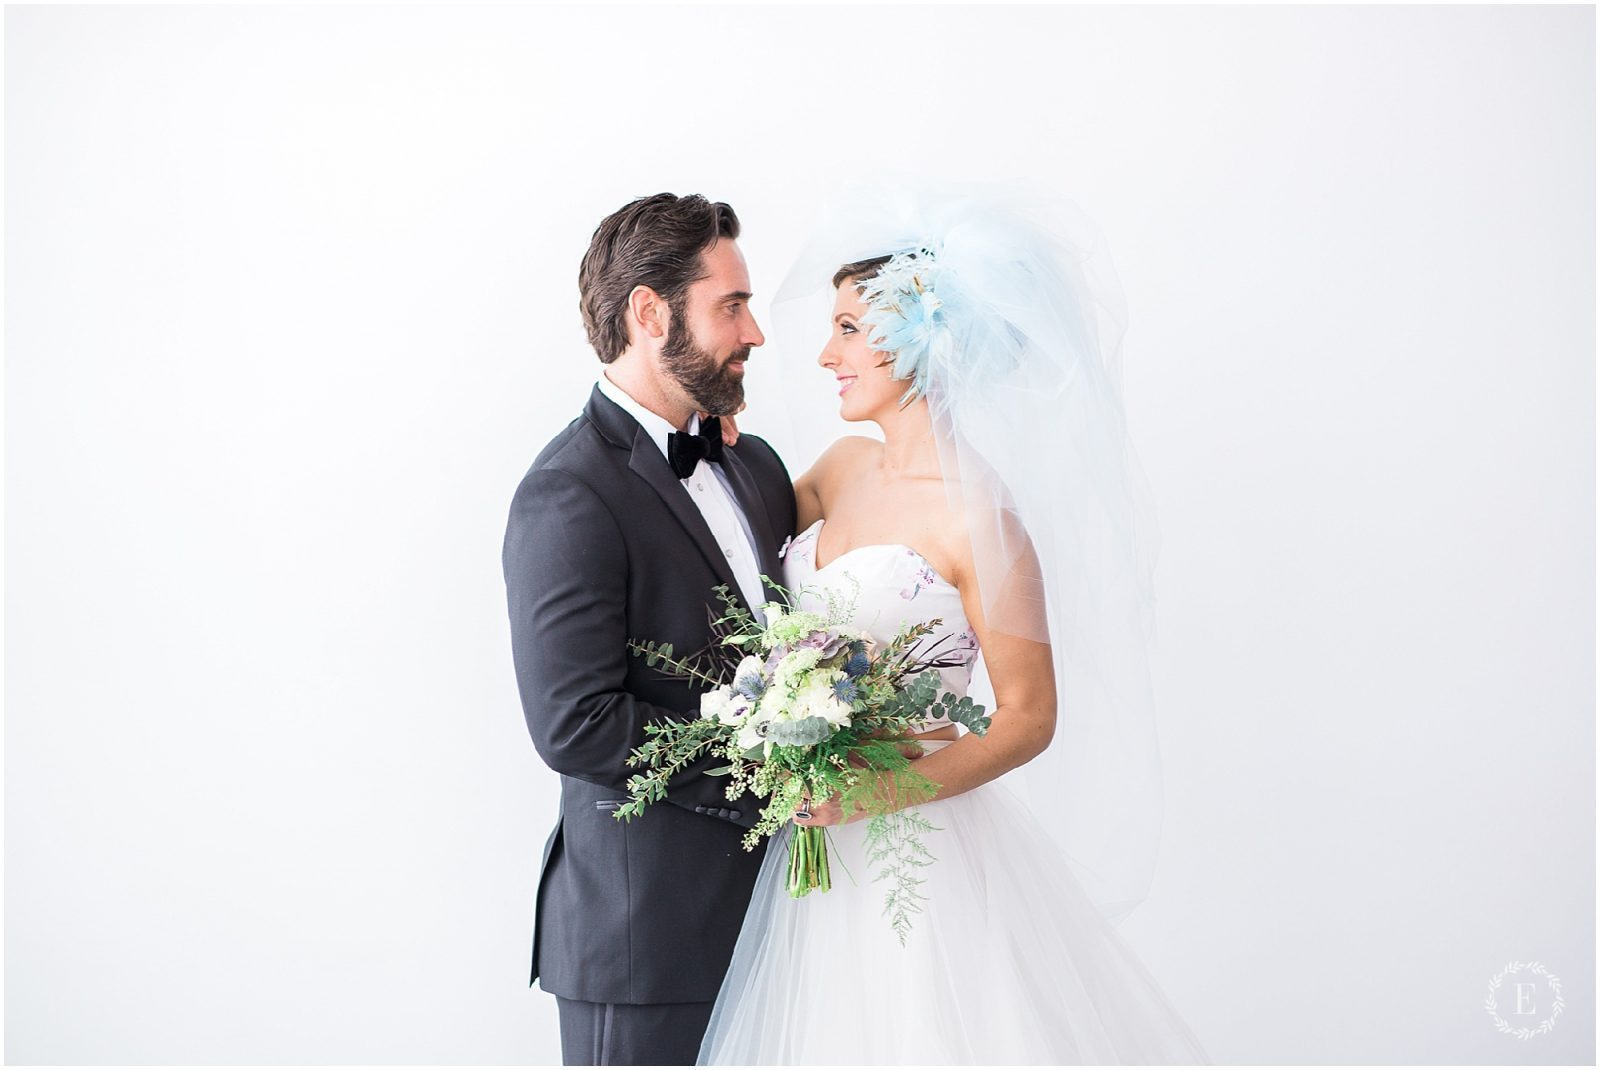 146 Carrie-John-Wedding-Styled-shoot-sex and the city-photosbyemmah.jpg